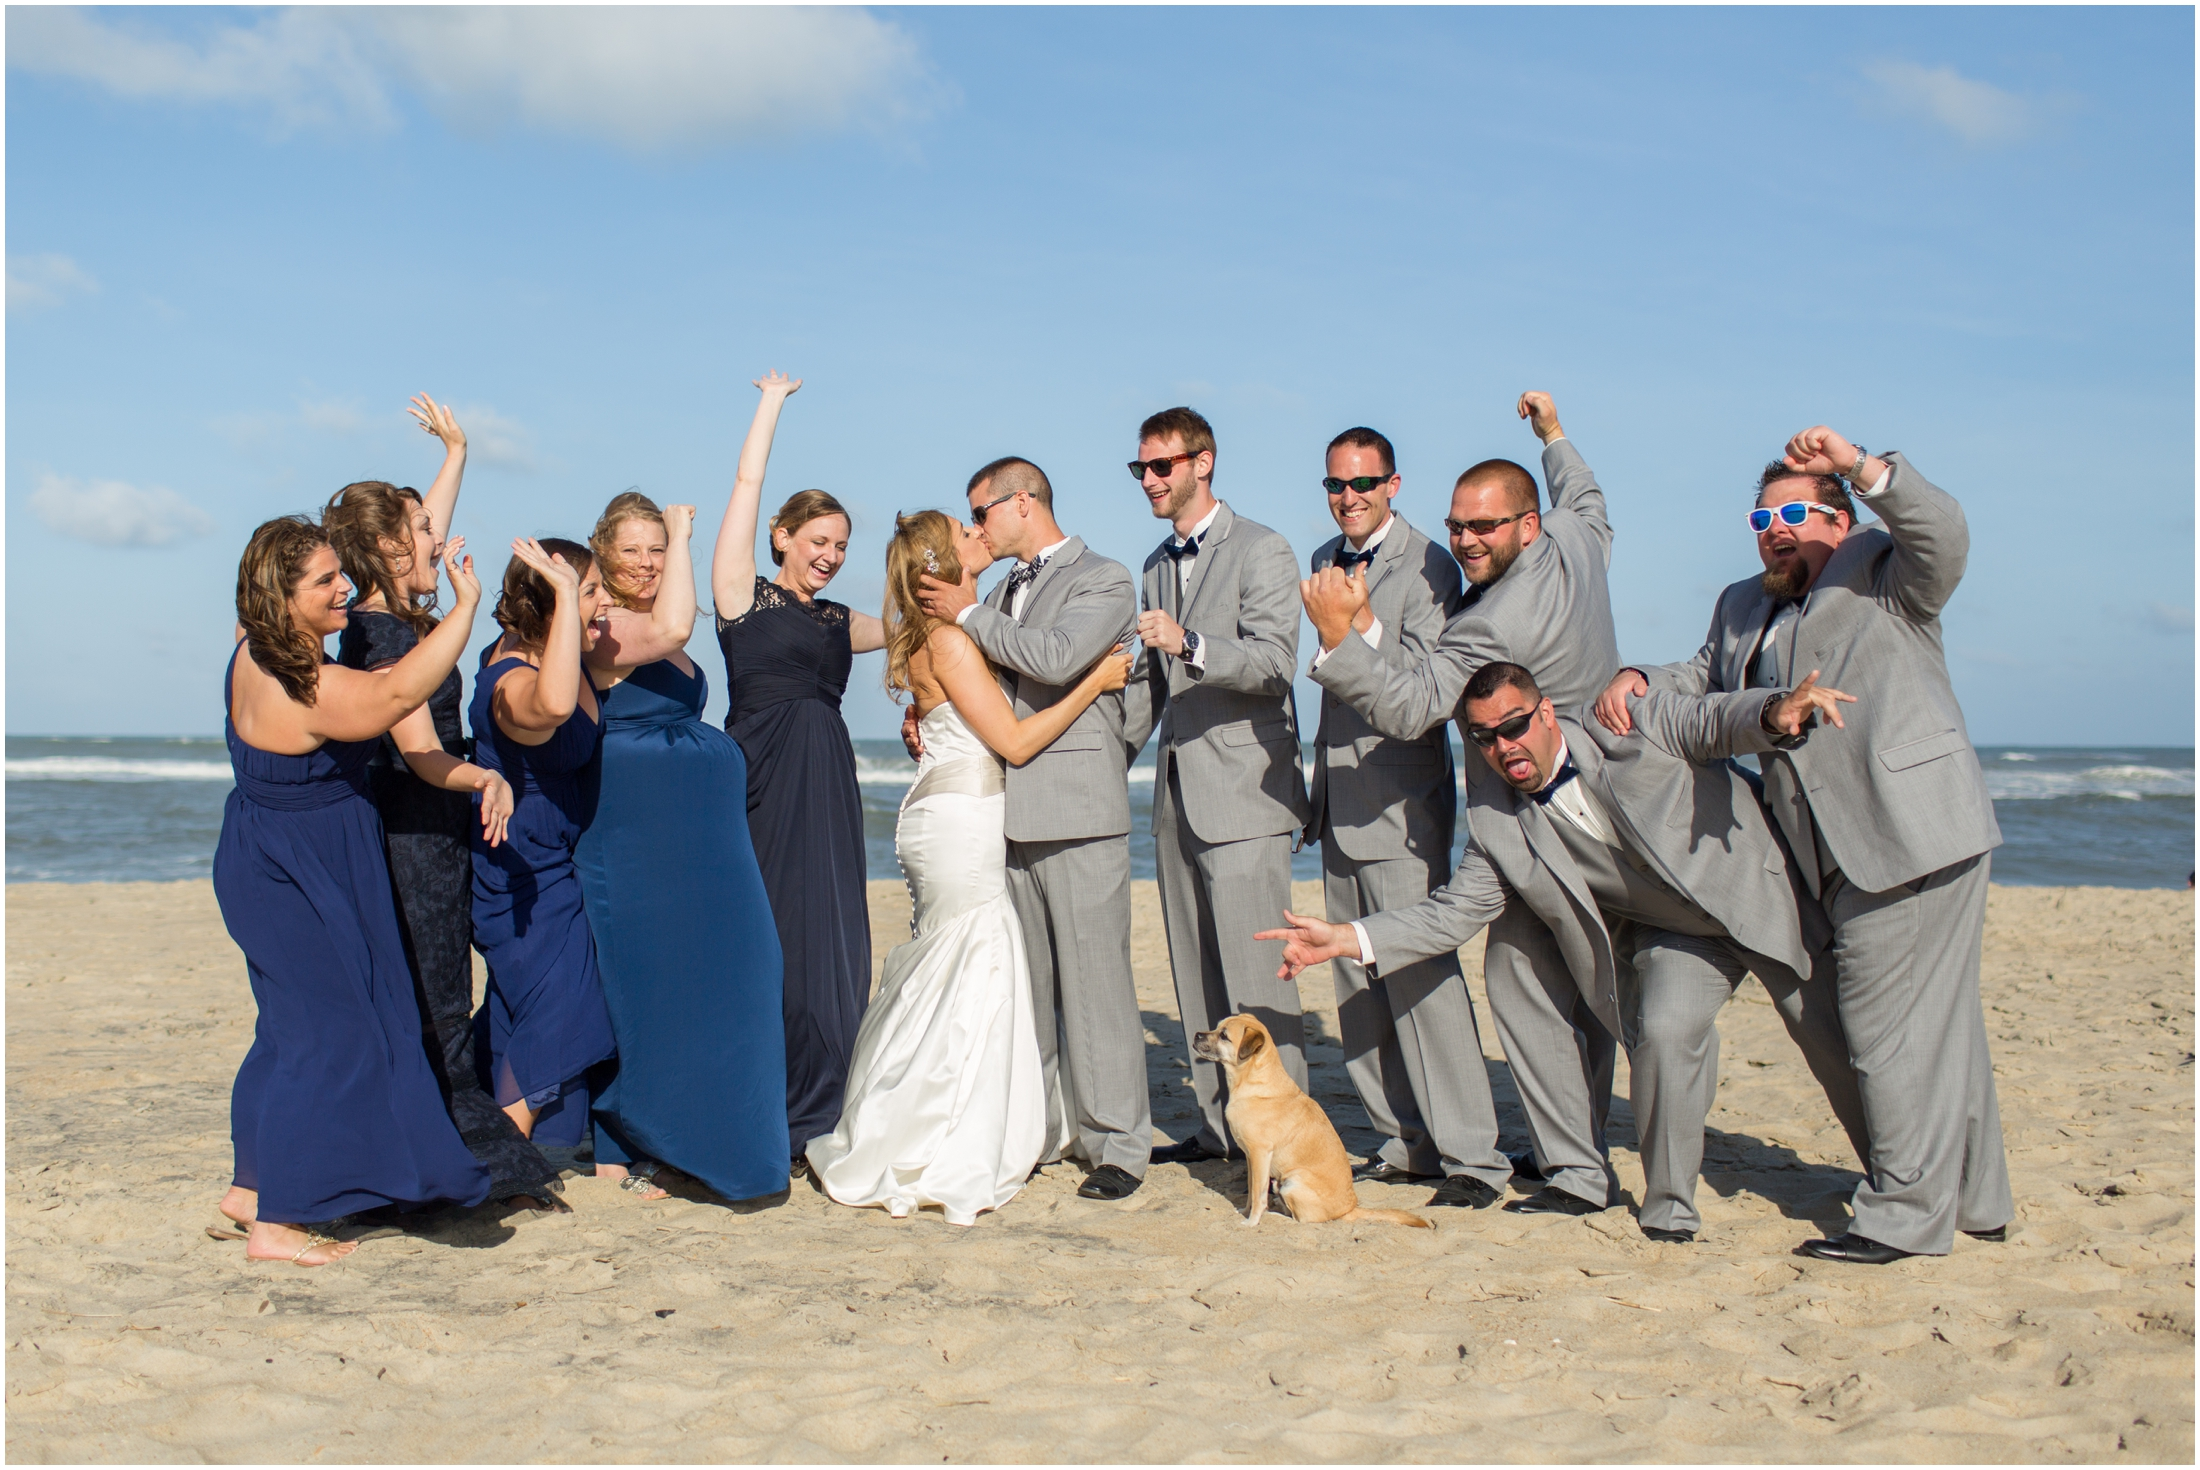 Pearce-Wedding-Bridal-Party-573.jpg